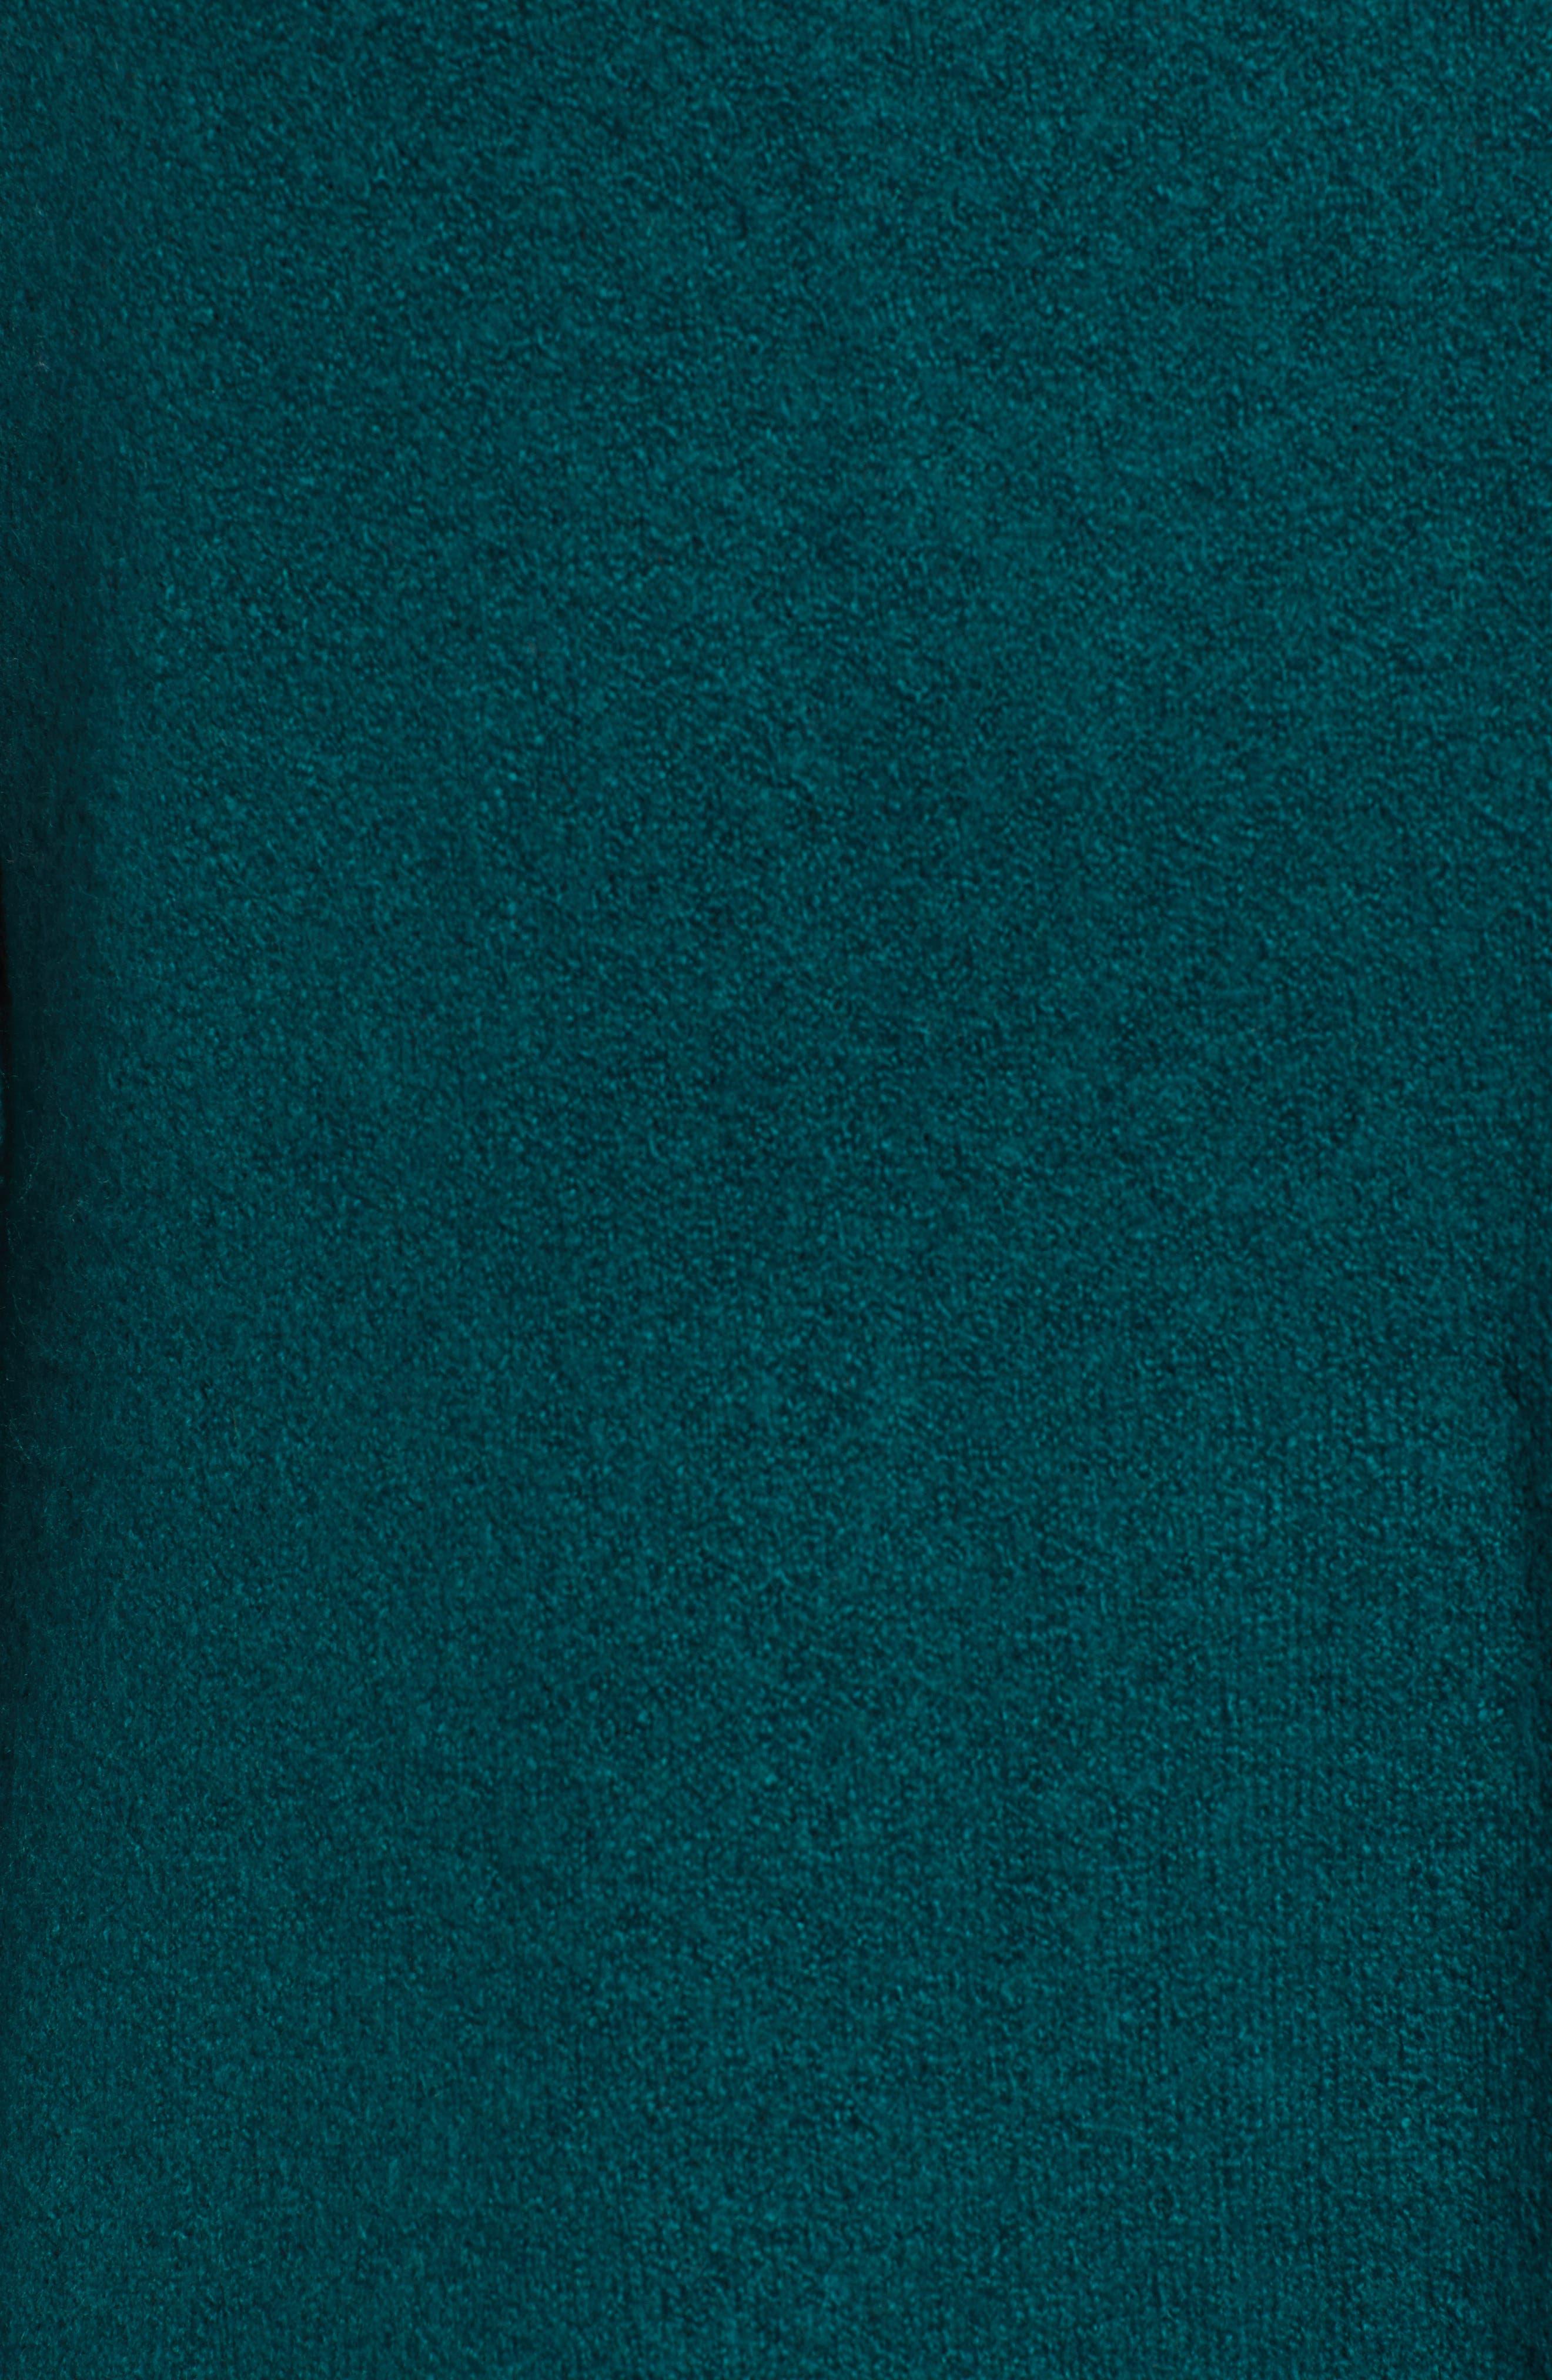 Bow Back Sweater,                             Alternate thumbnail 5, color,                             GREEN BOTANICAL